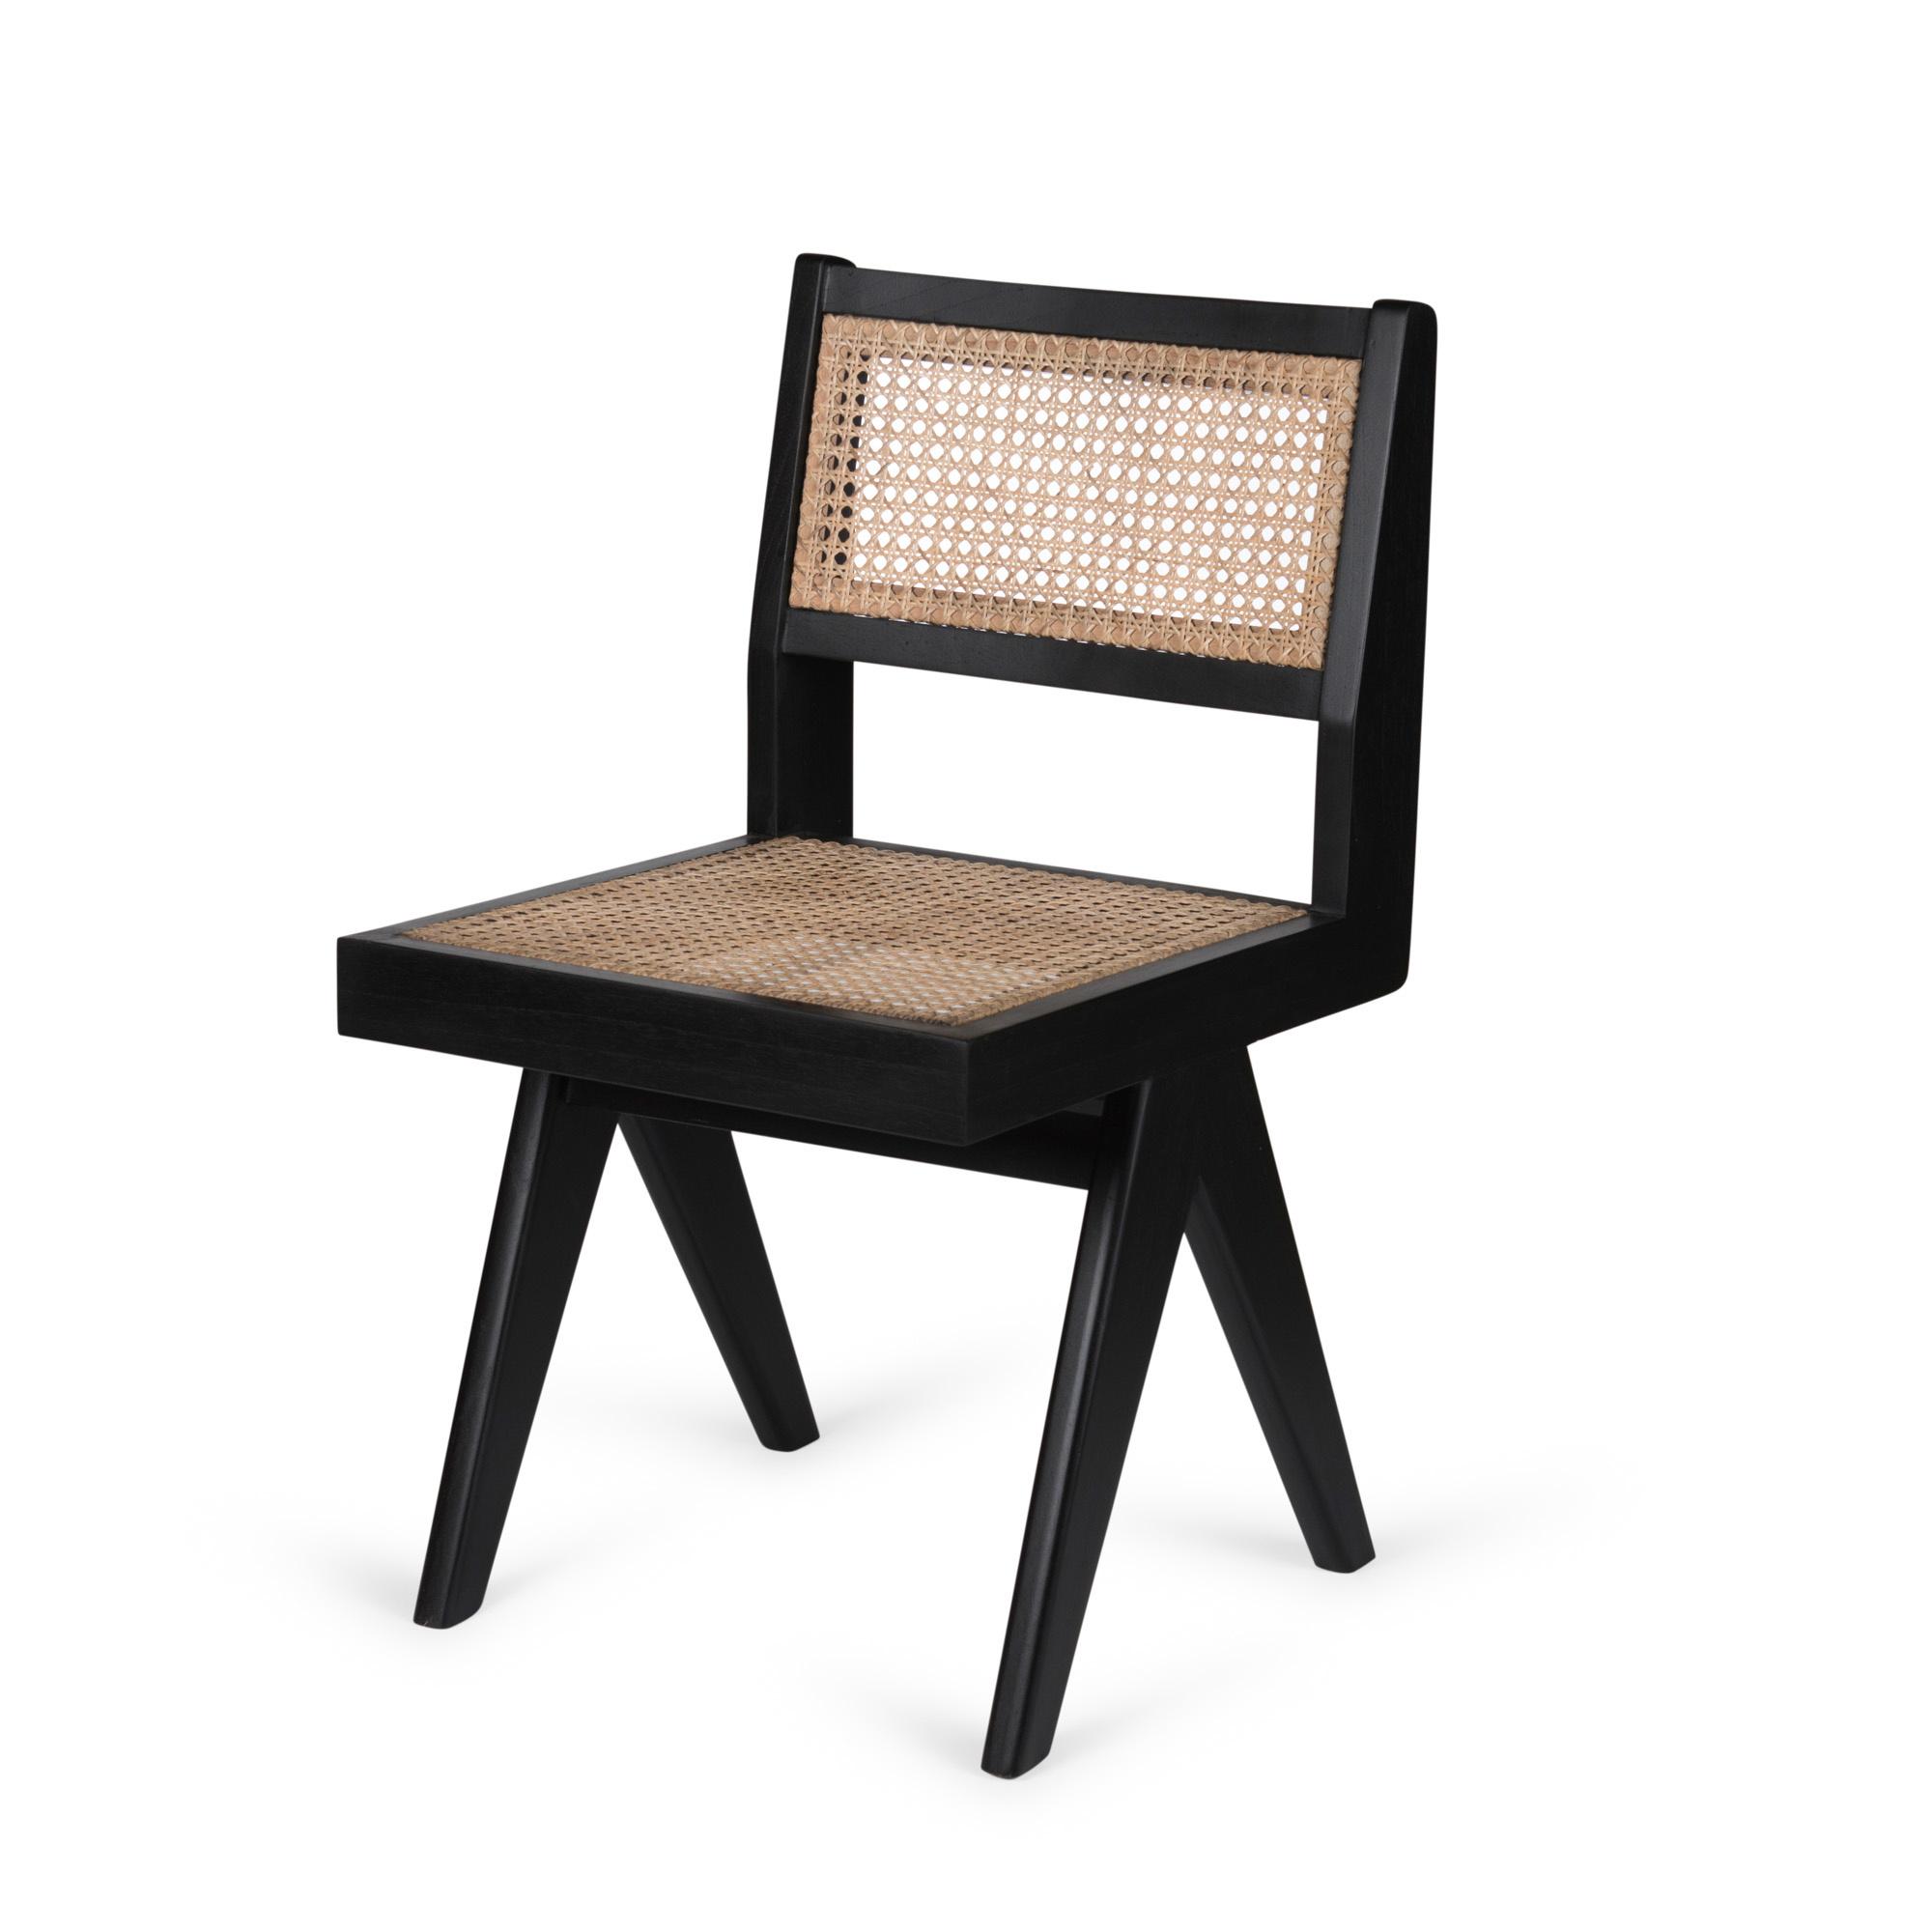 Dining Chair - Kohle schwarz-1